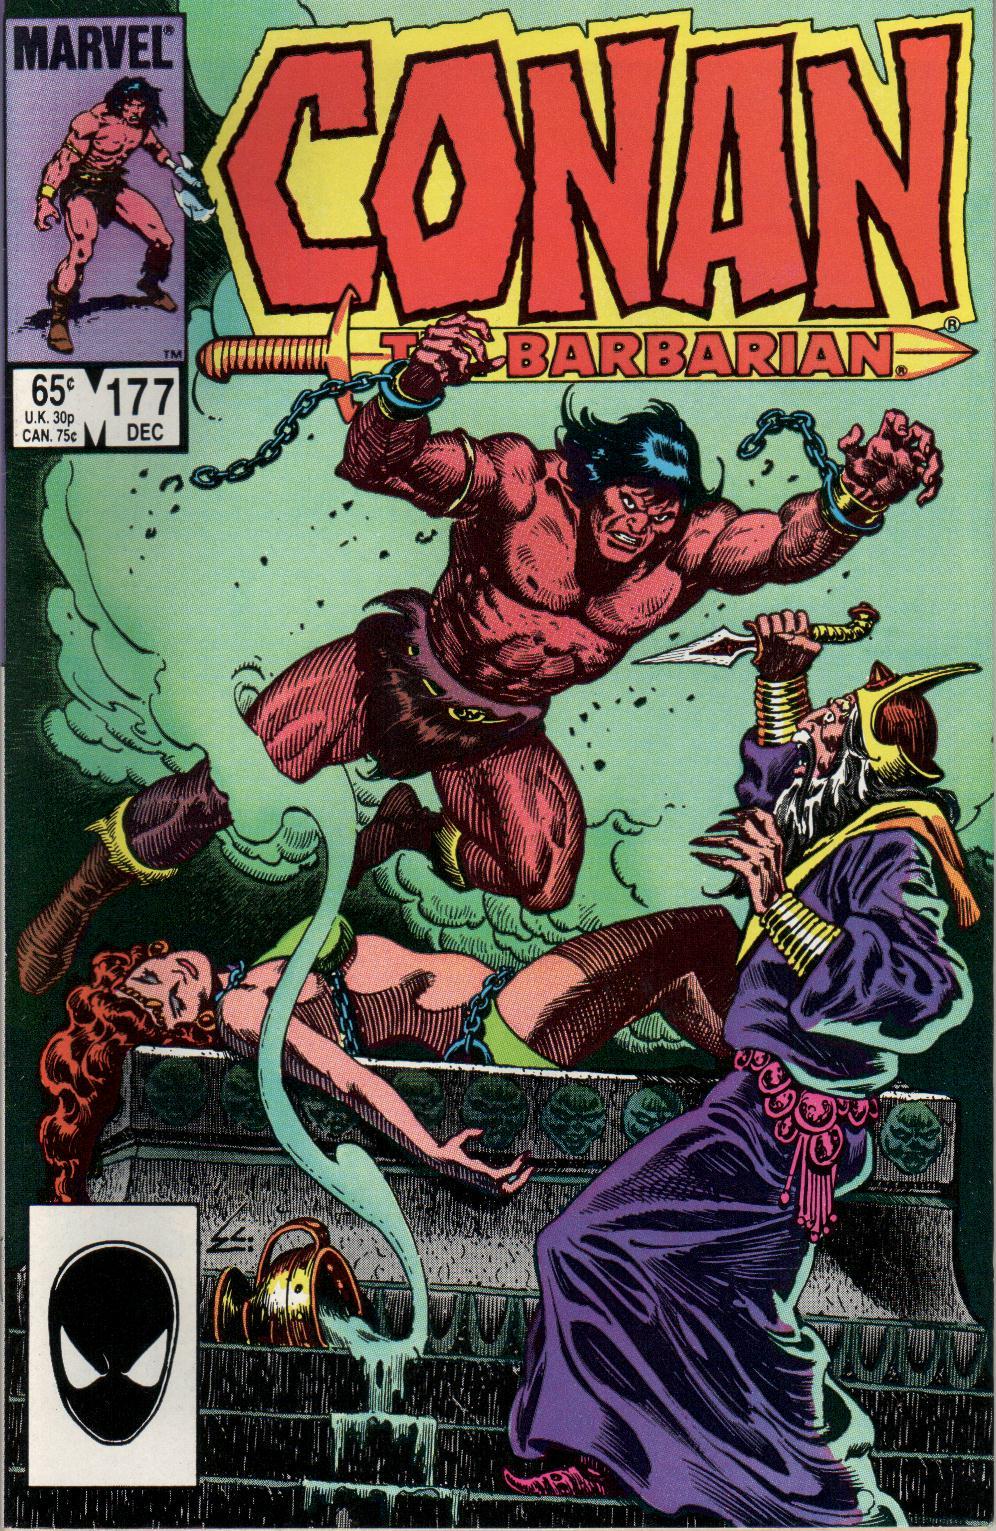 Conan the Barbarian 177